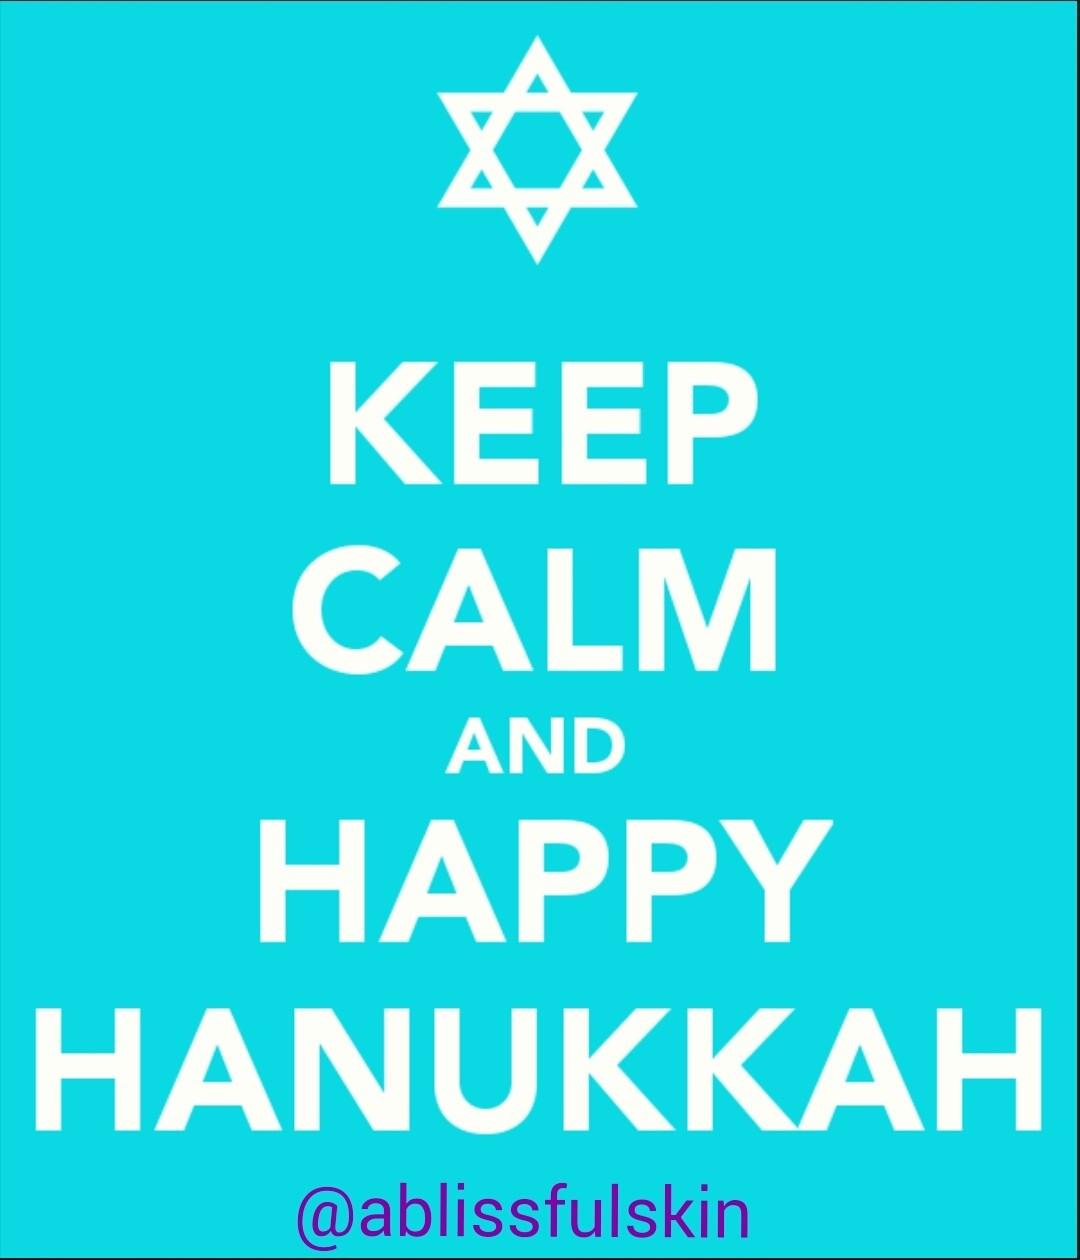 Happy Hanukkah friends! Follow @ablissfulskin #happyhanukkah #love #friends #westlakevillage #brows #facials #skincare